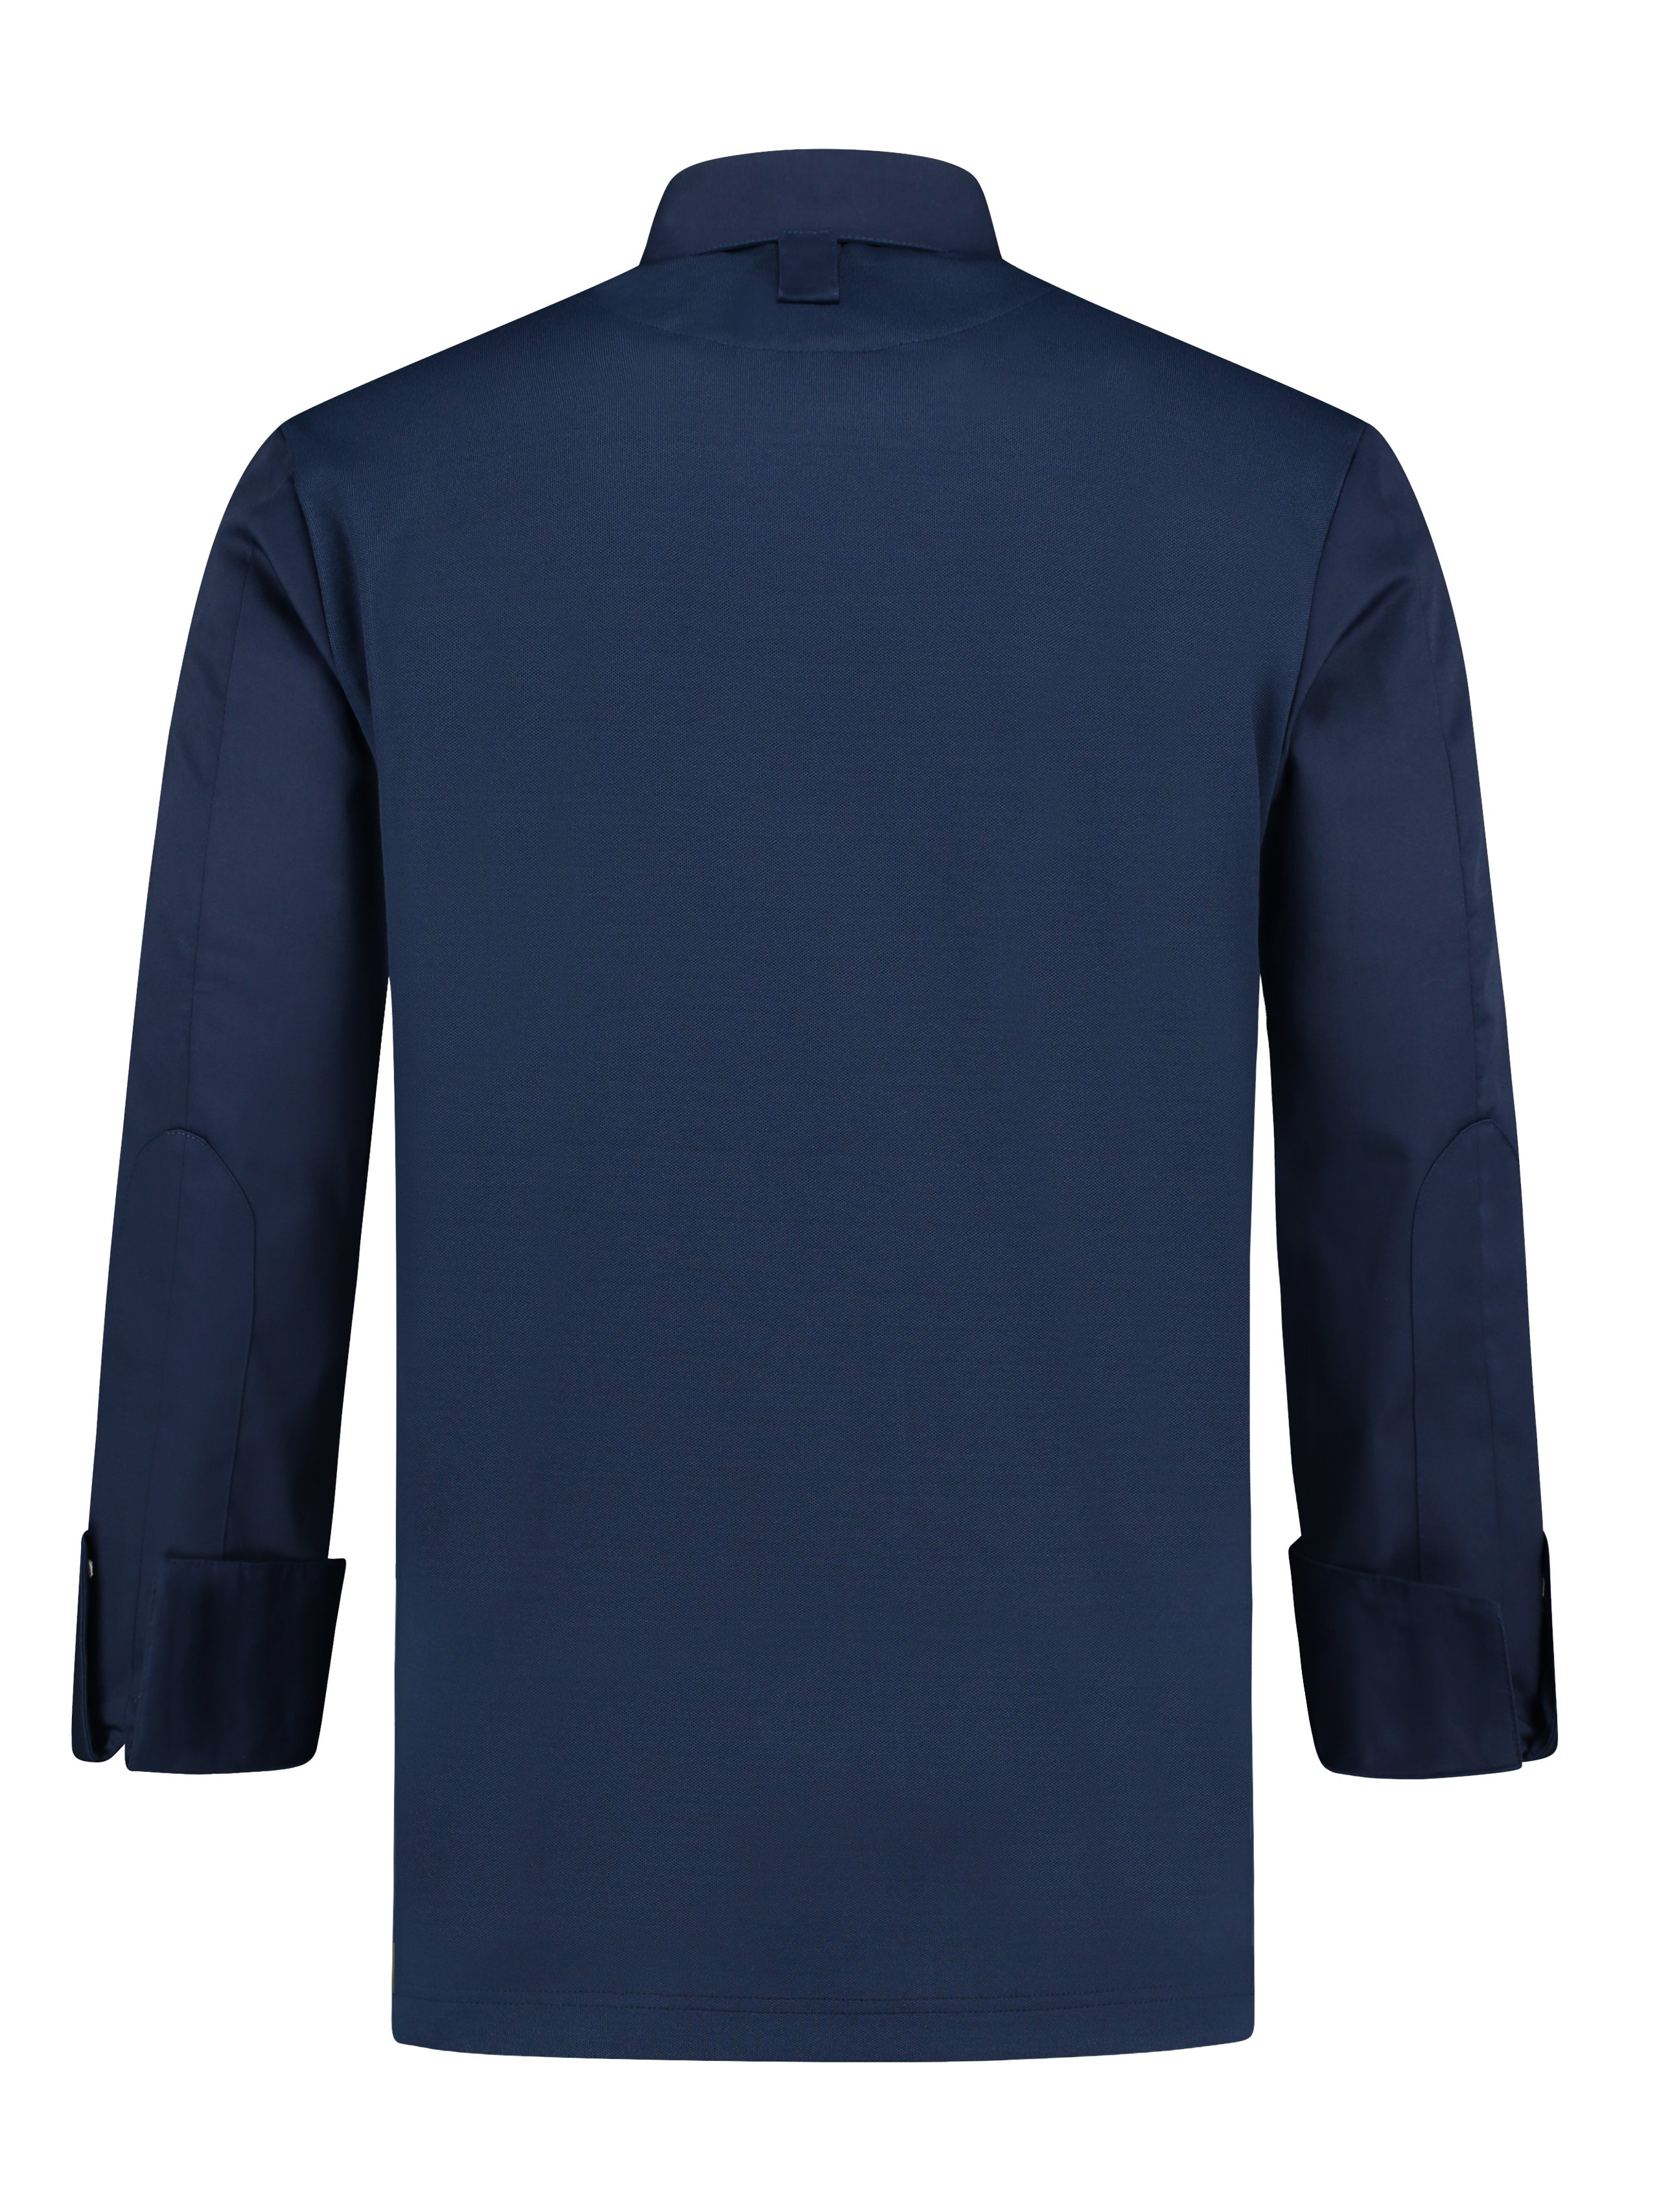 Chef Jacket Angelo Patriot Blue